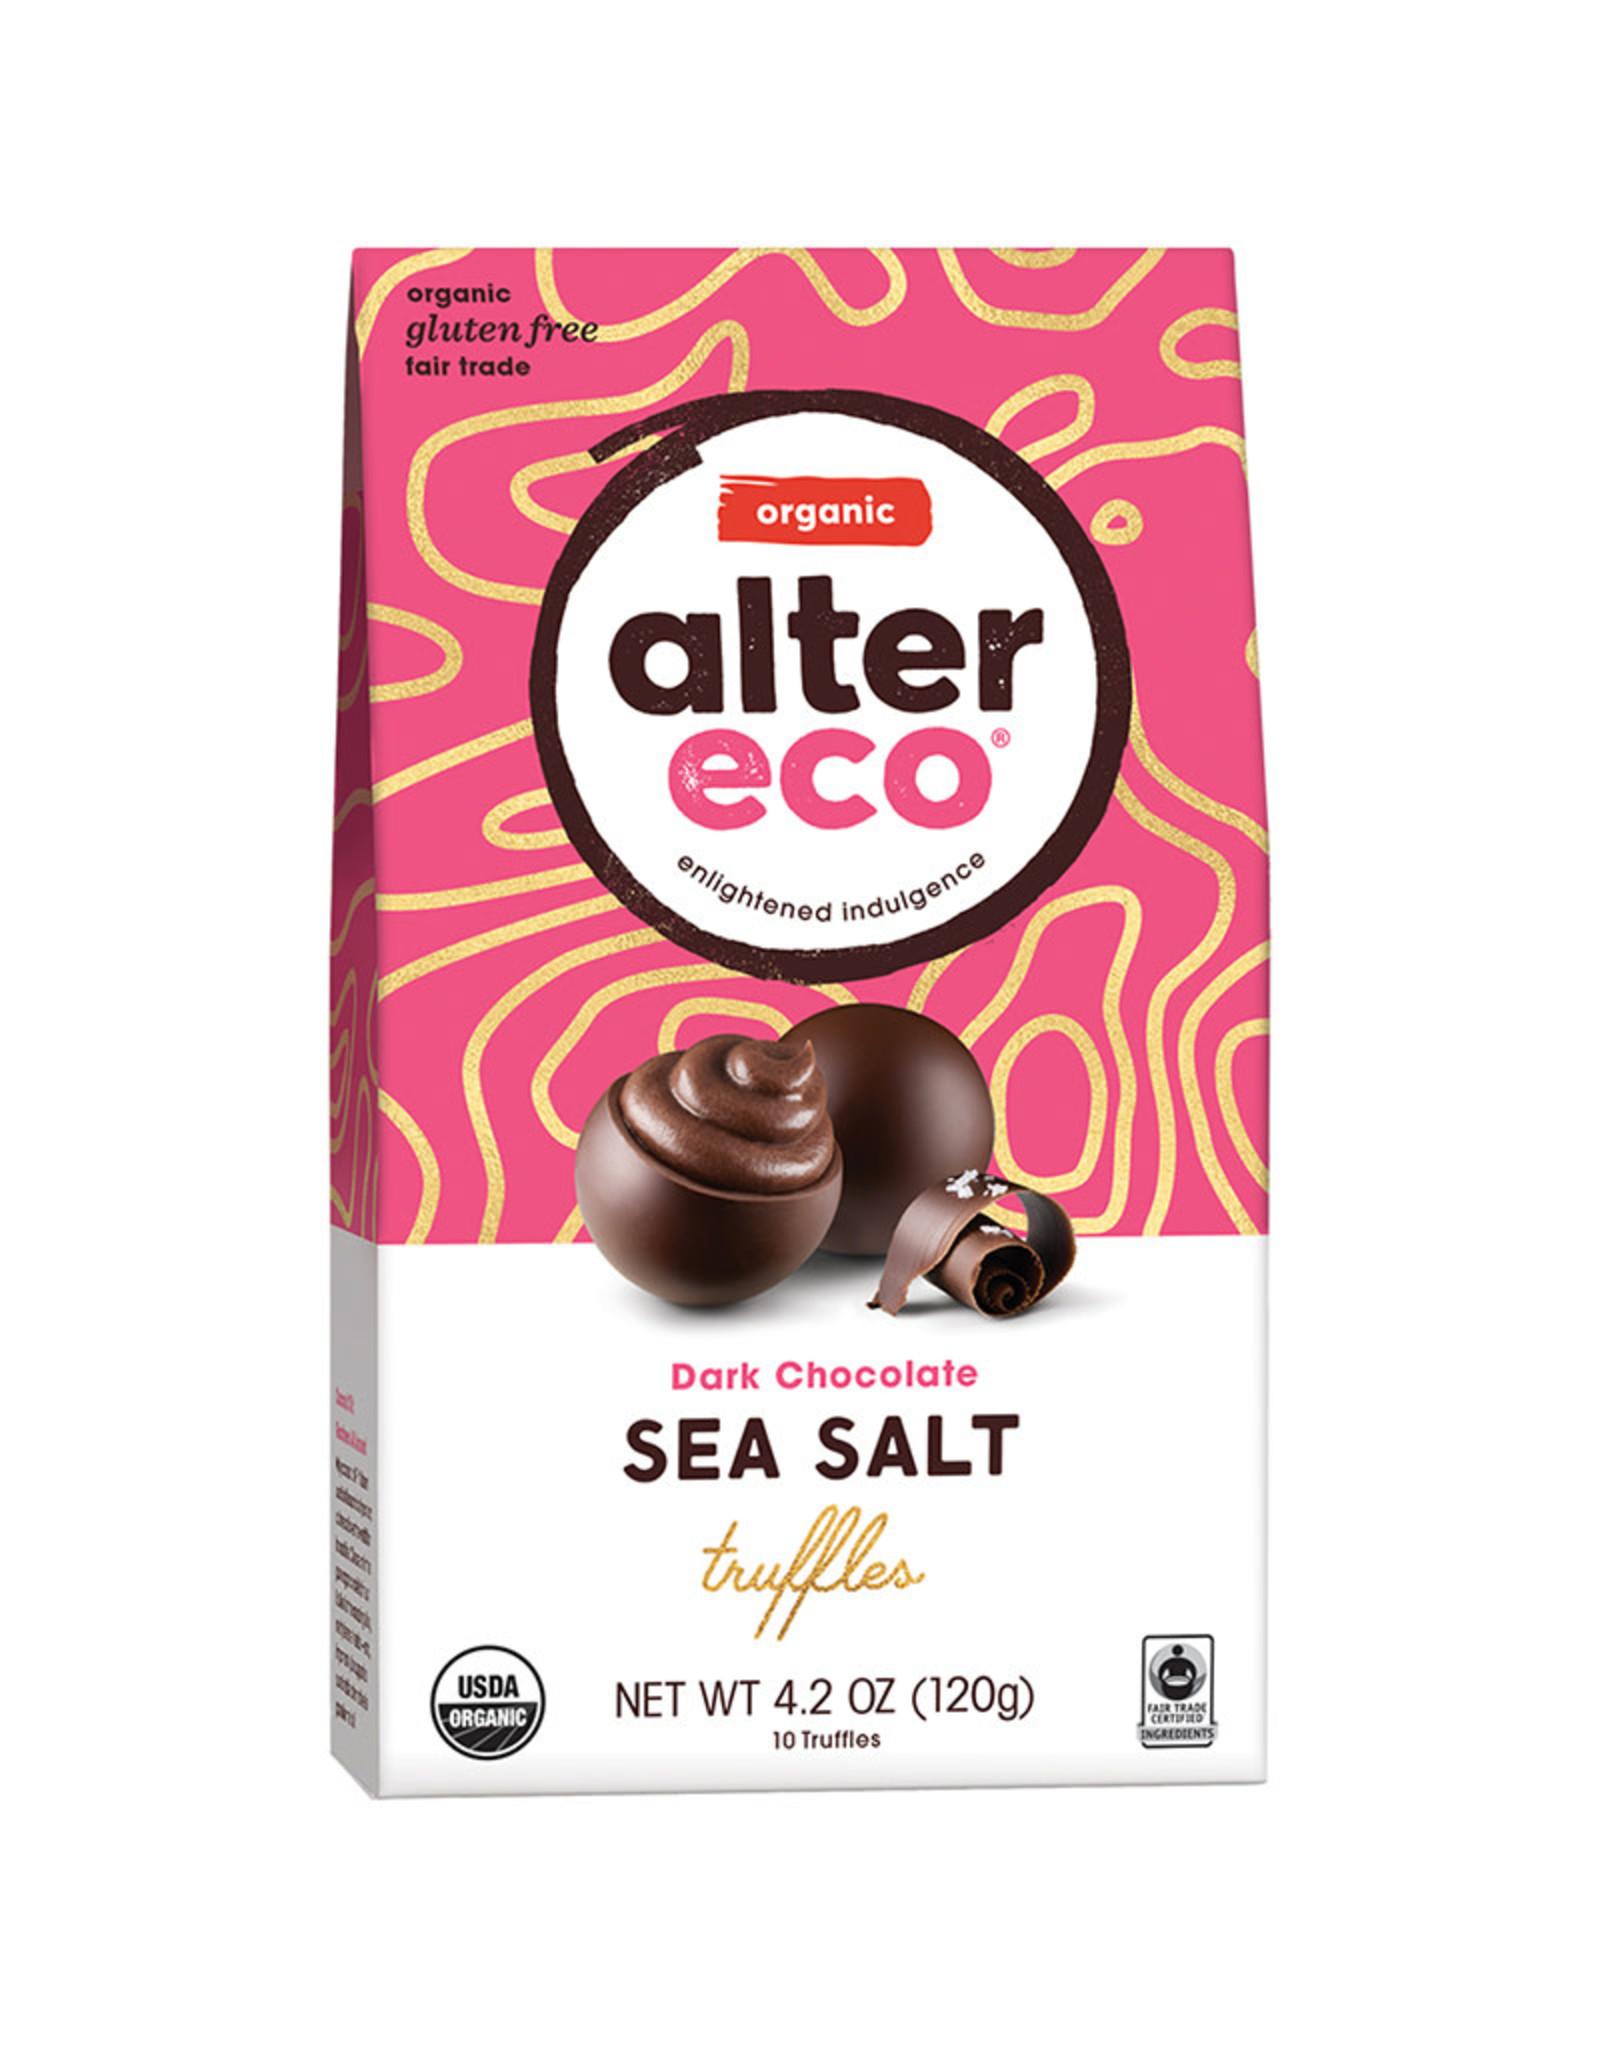 Alter Eco Alter Eco - Truffles, Sea Salt - Full Box